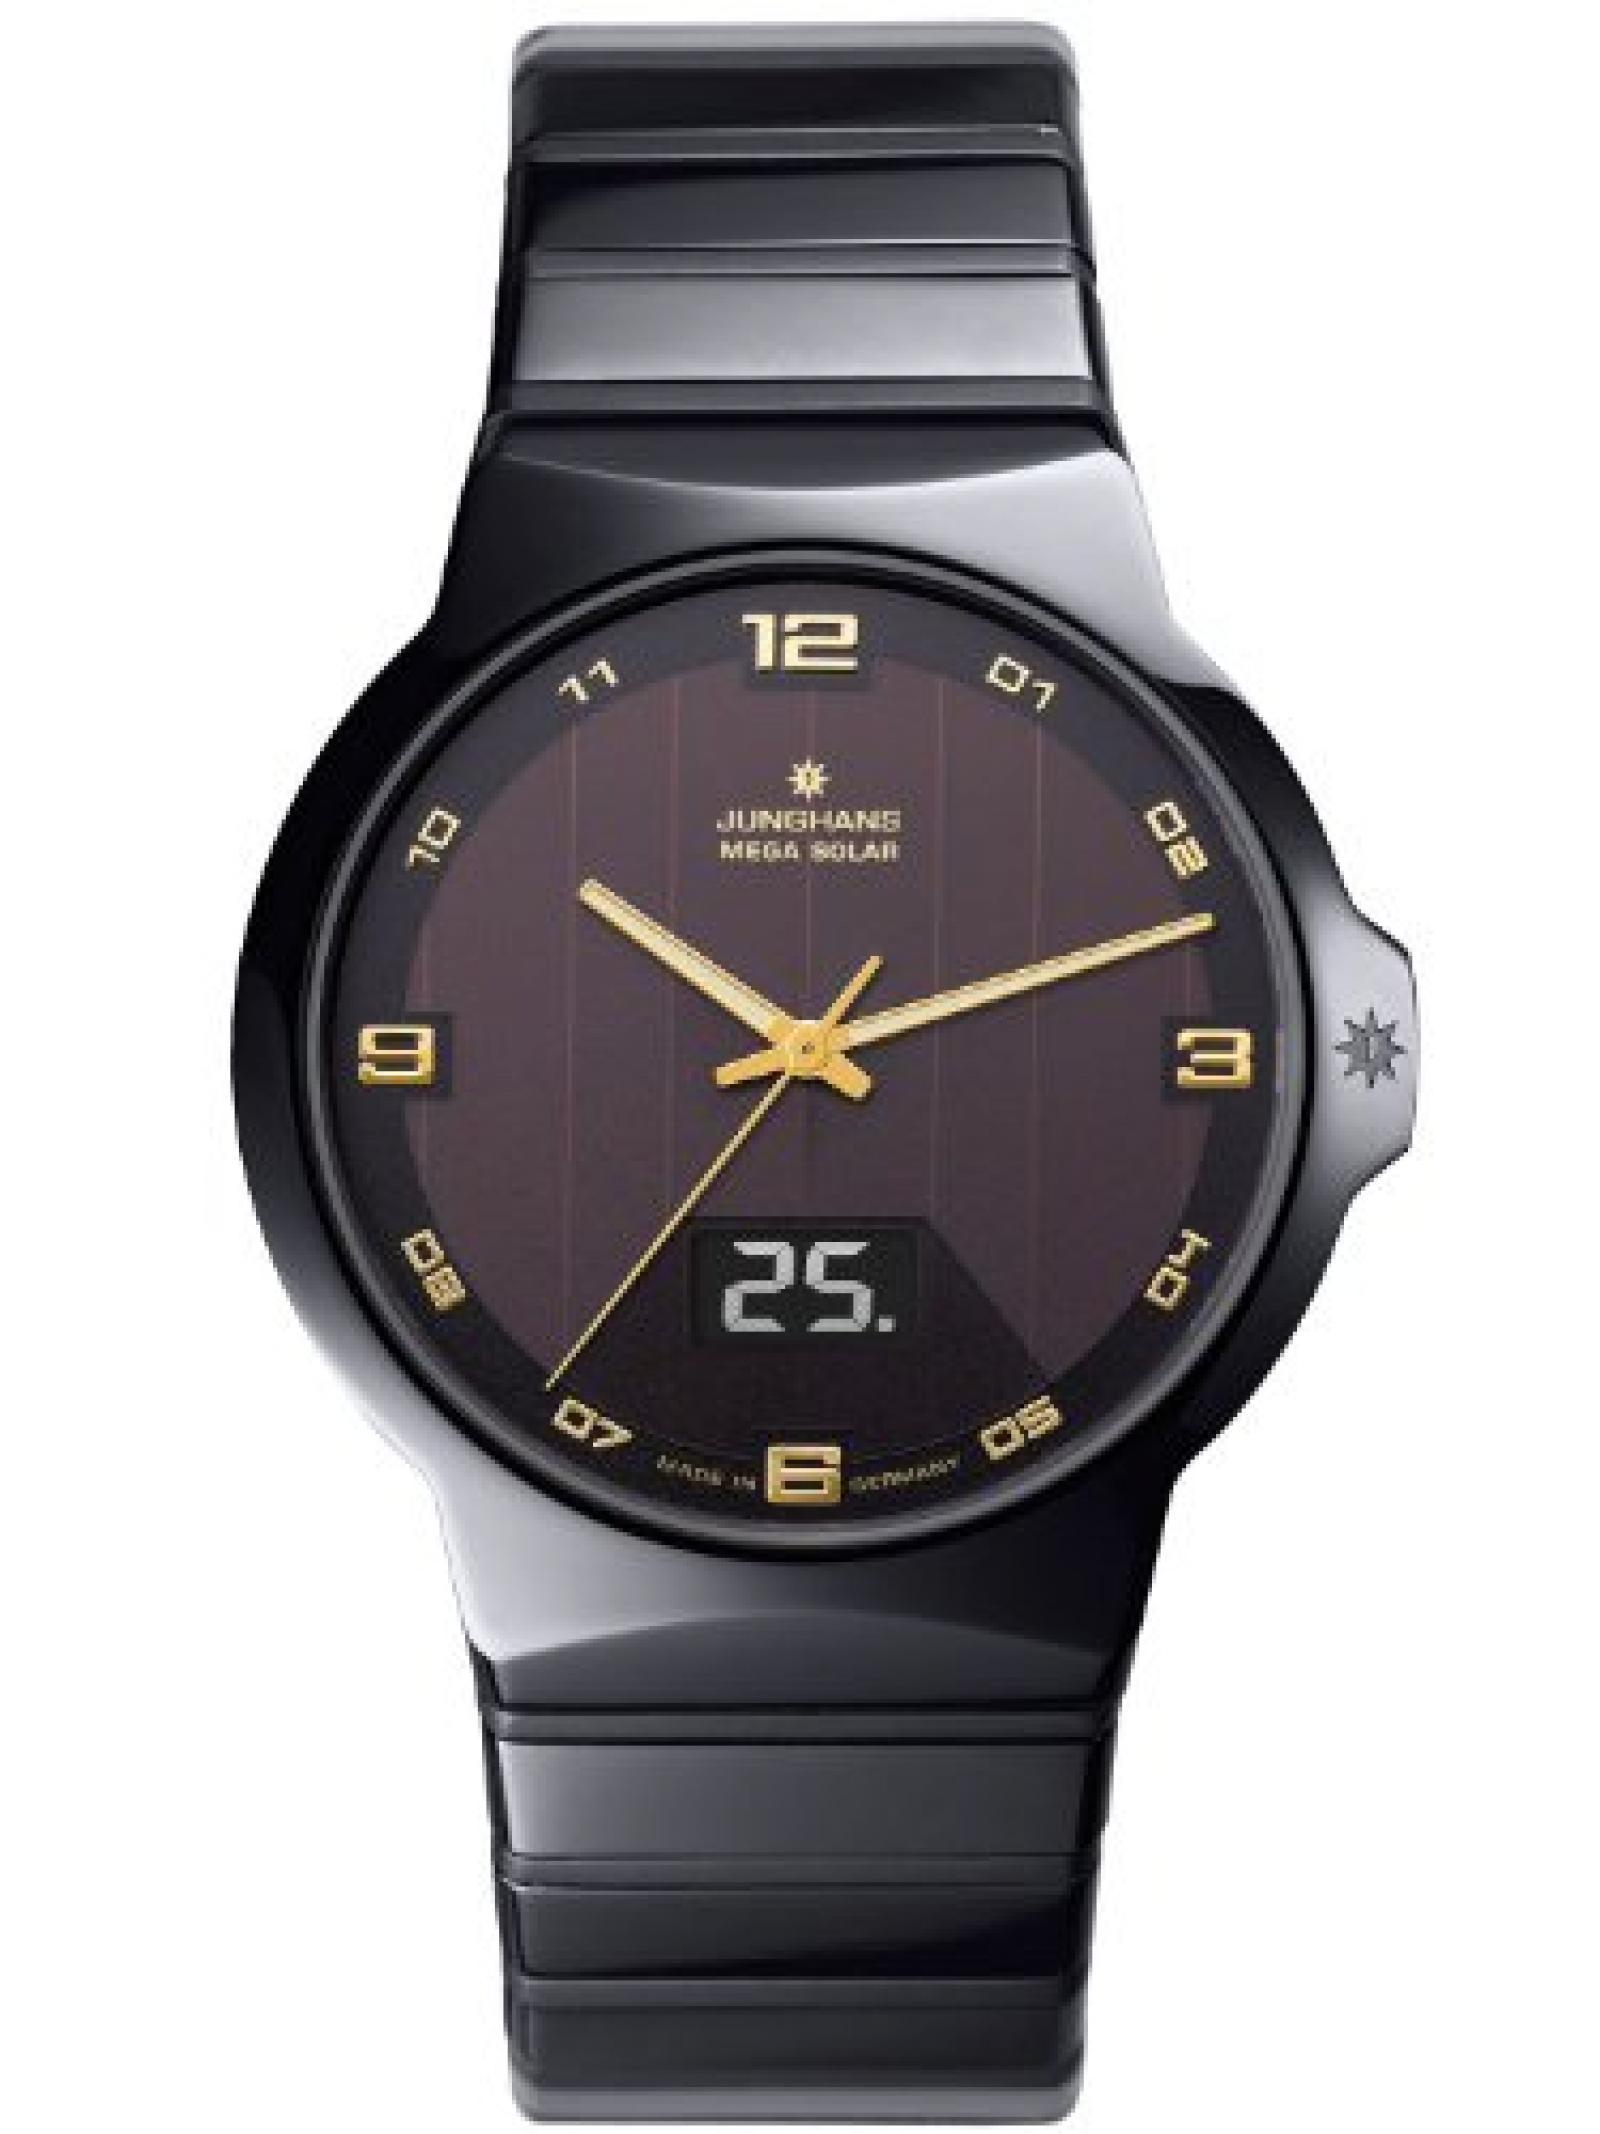 Junghans Force Herren Funk-Solar-Uhr 018/1435.44